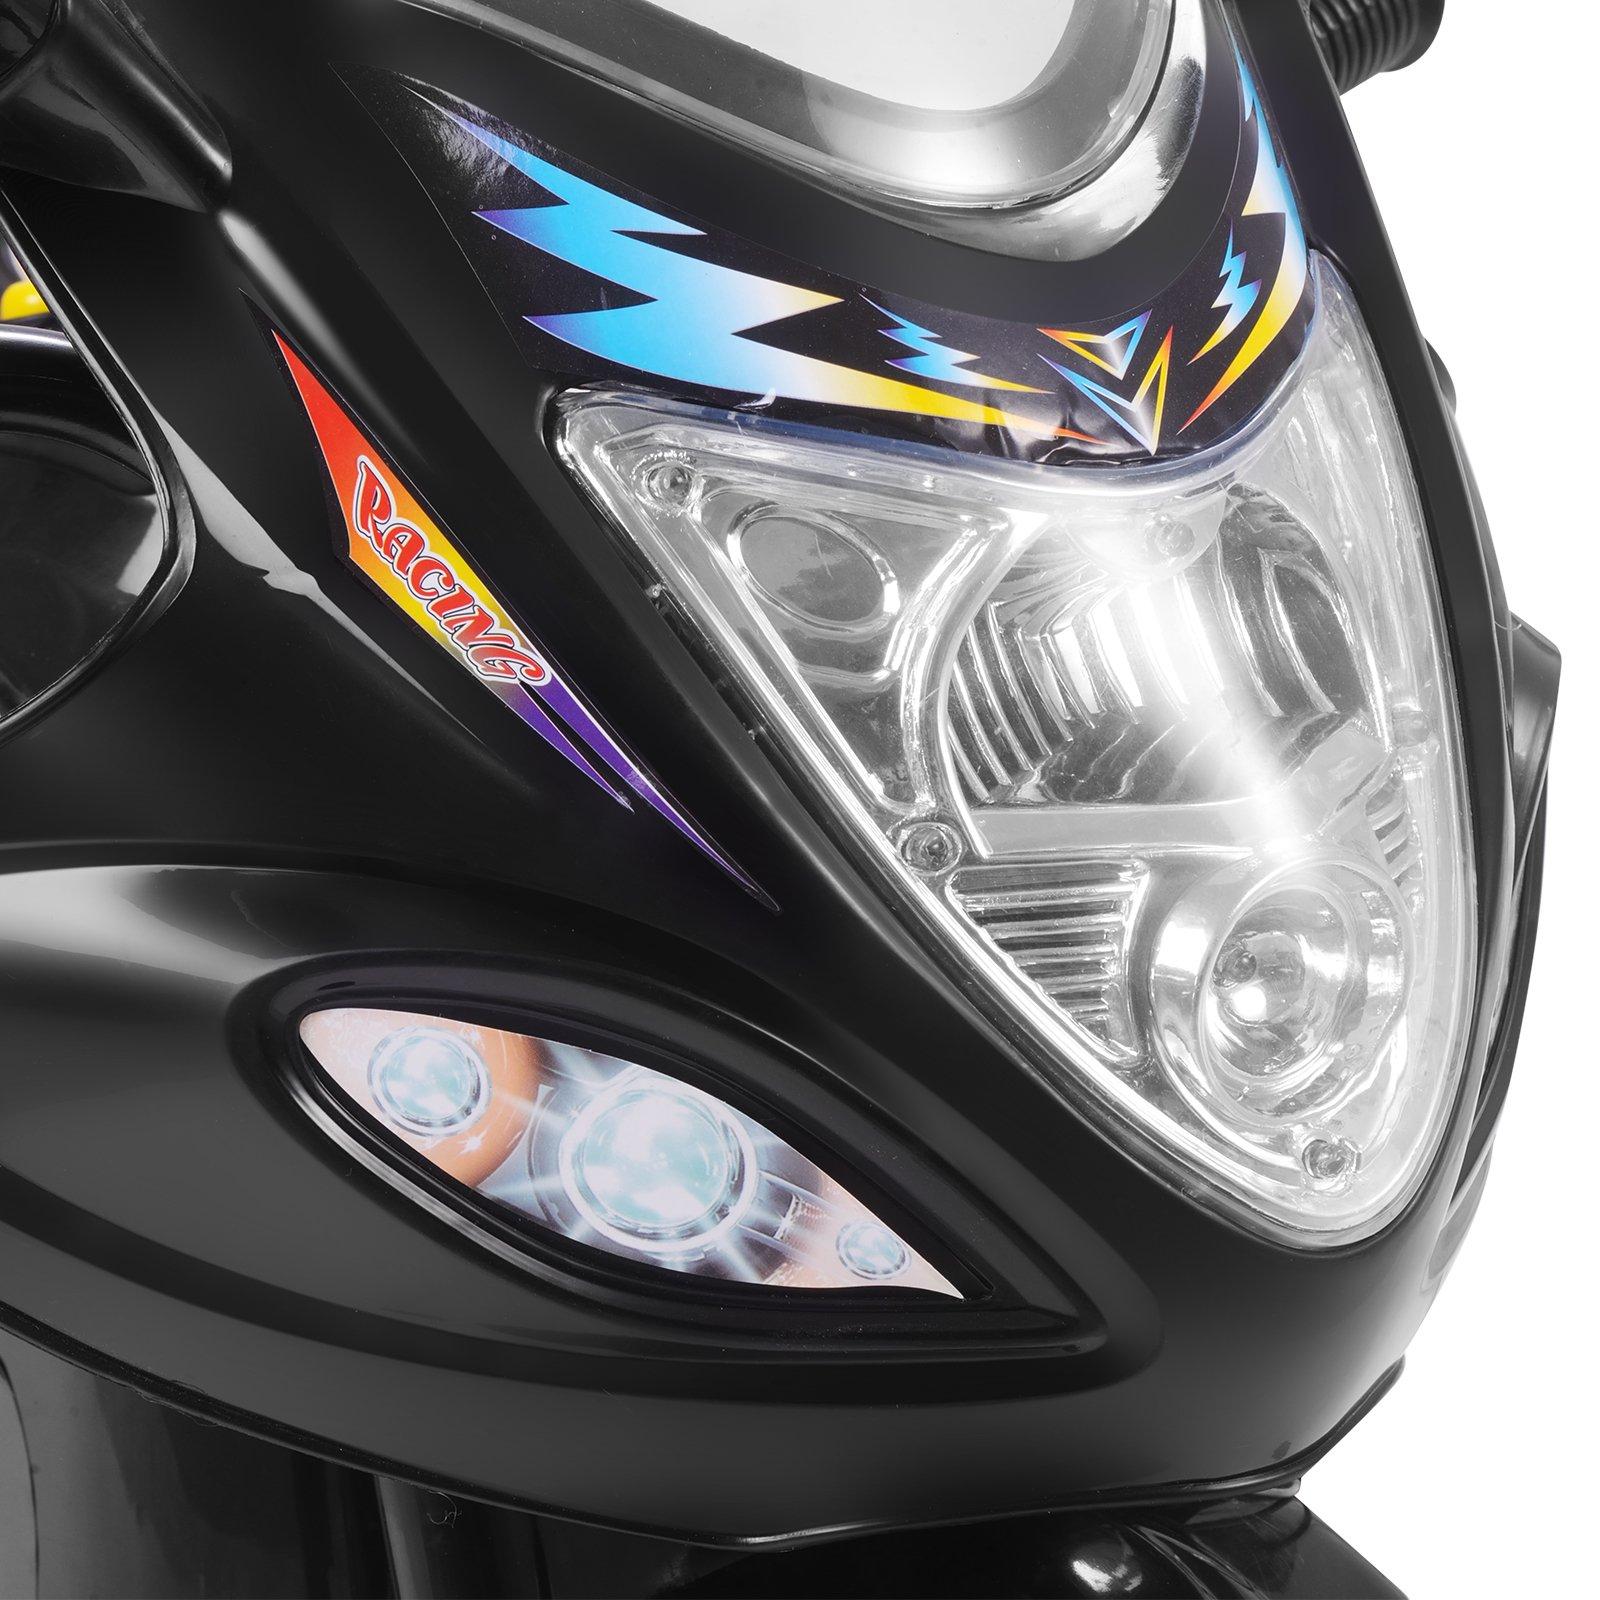 Uenjoy Murtisol Kids Ride on Motorcycle 6V Electric Motorcycle 2 Wheels Black by Uenjoy (Image #5)